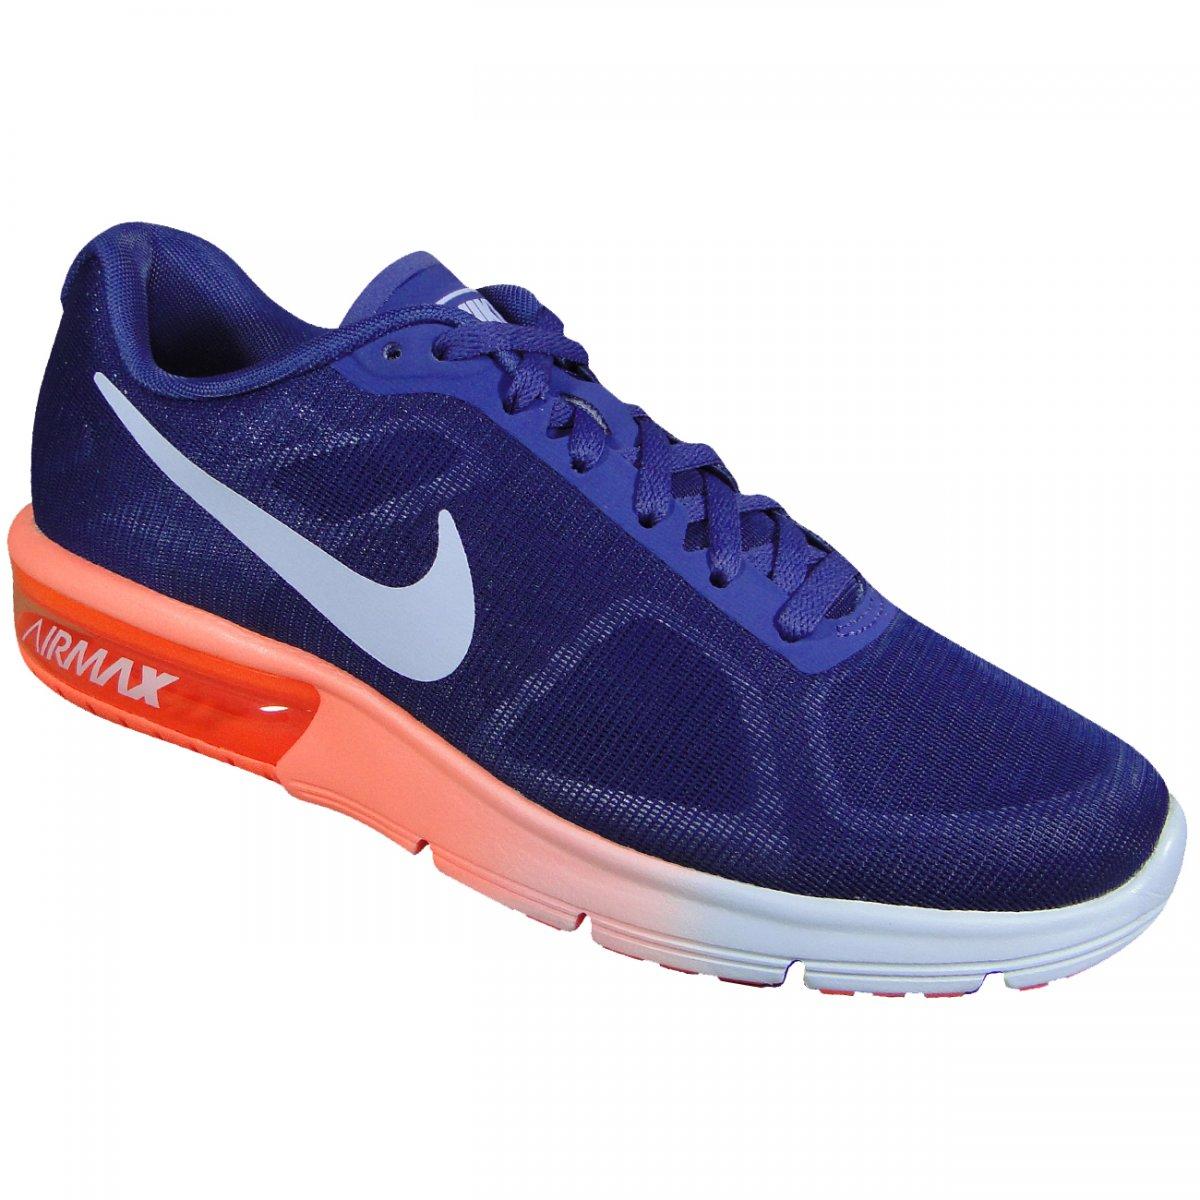 Tenis Nike Air Max Sequent 719916 505 - Uva Coral - Chuteira Nike ... 7e3b3c3e6f